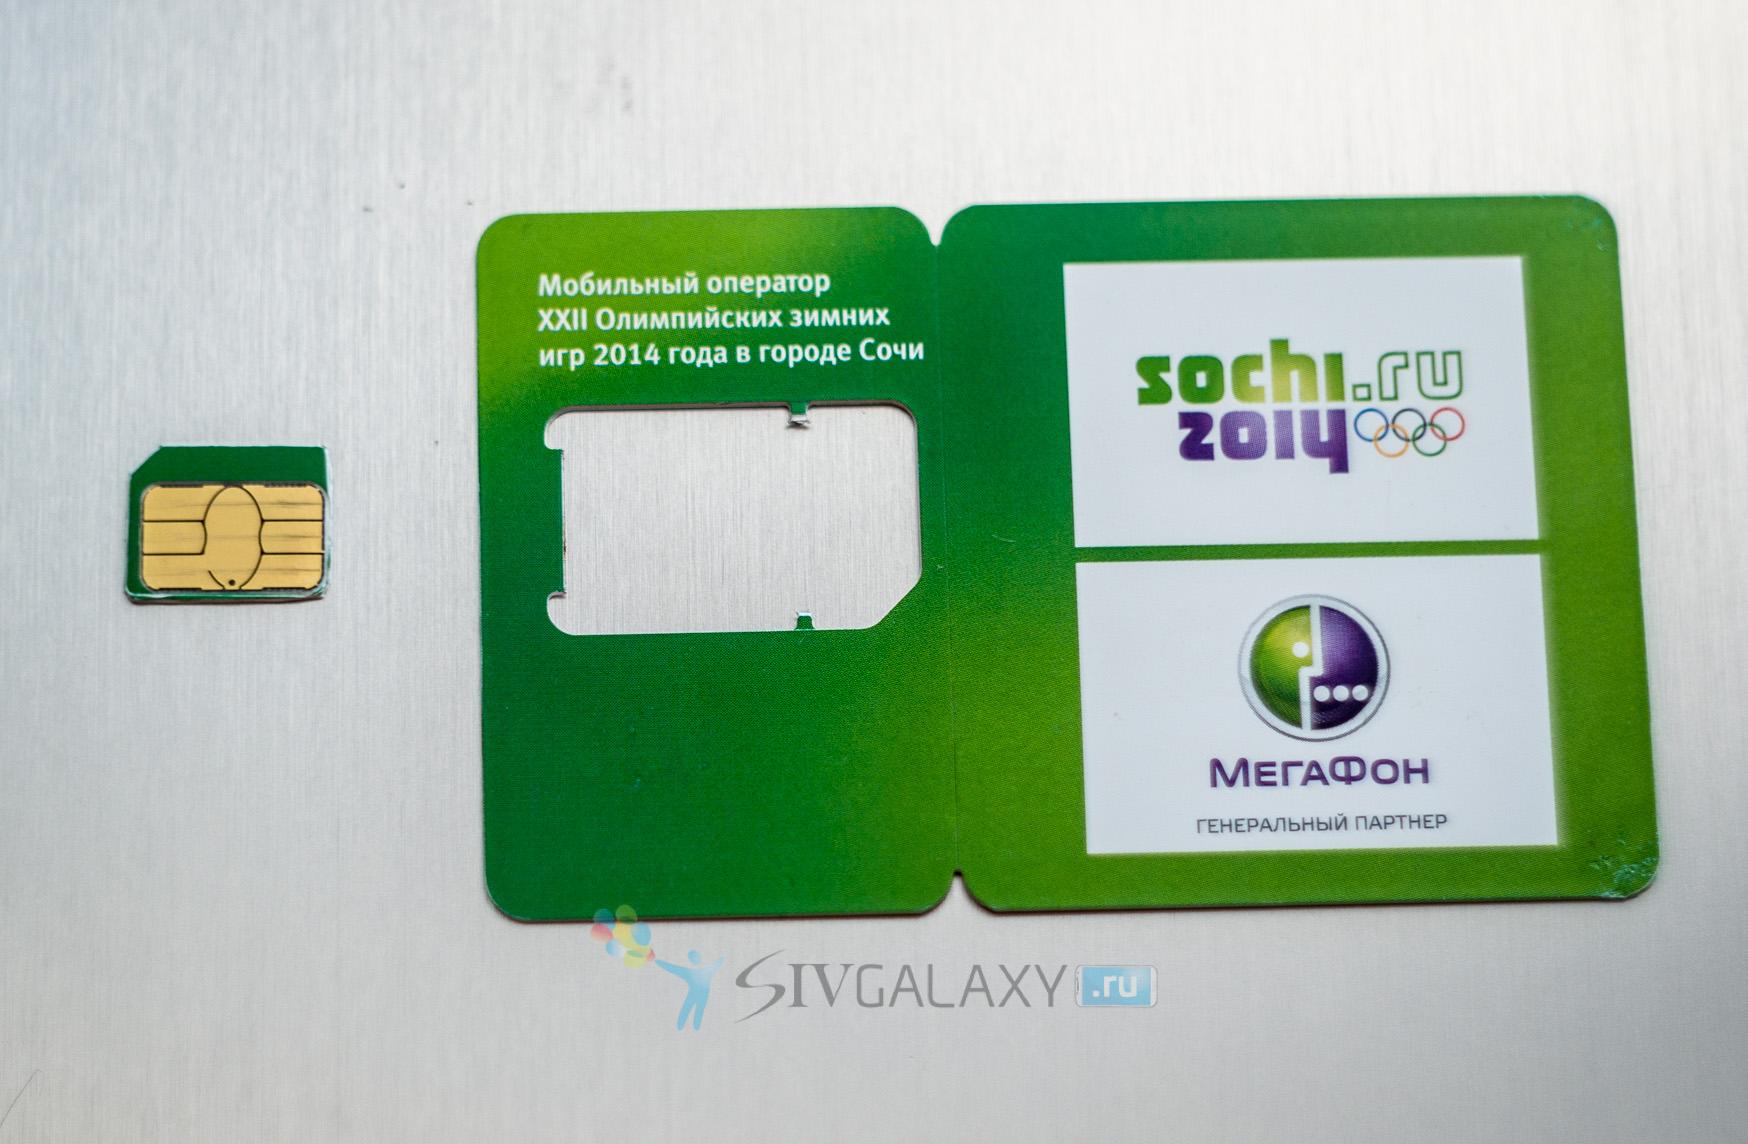 Samsung Galaxy S4 - SIM карта Мегафон